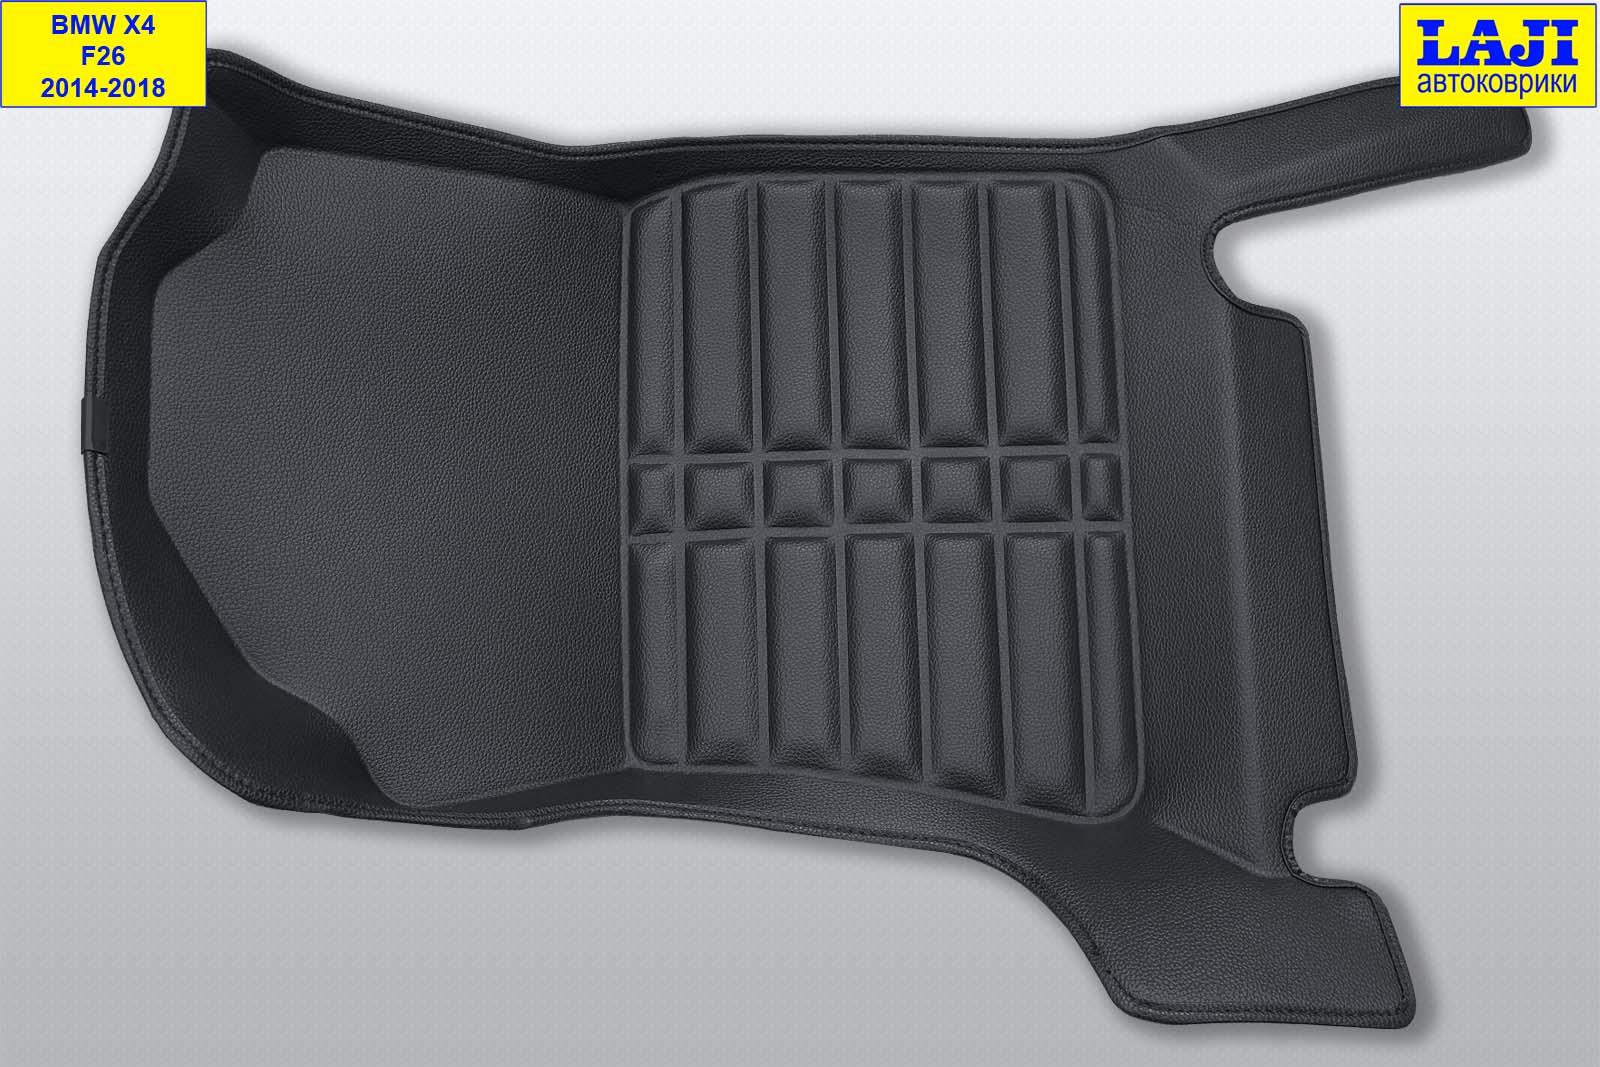 5D коврики в салон BMW X4 (F26) 2014-2018 5